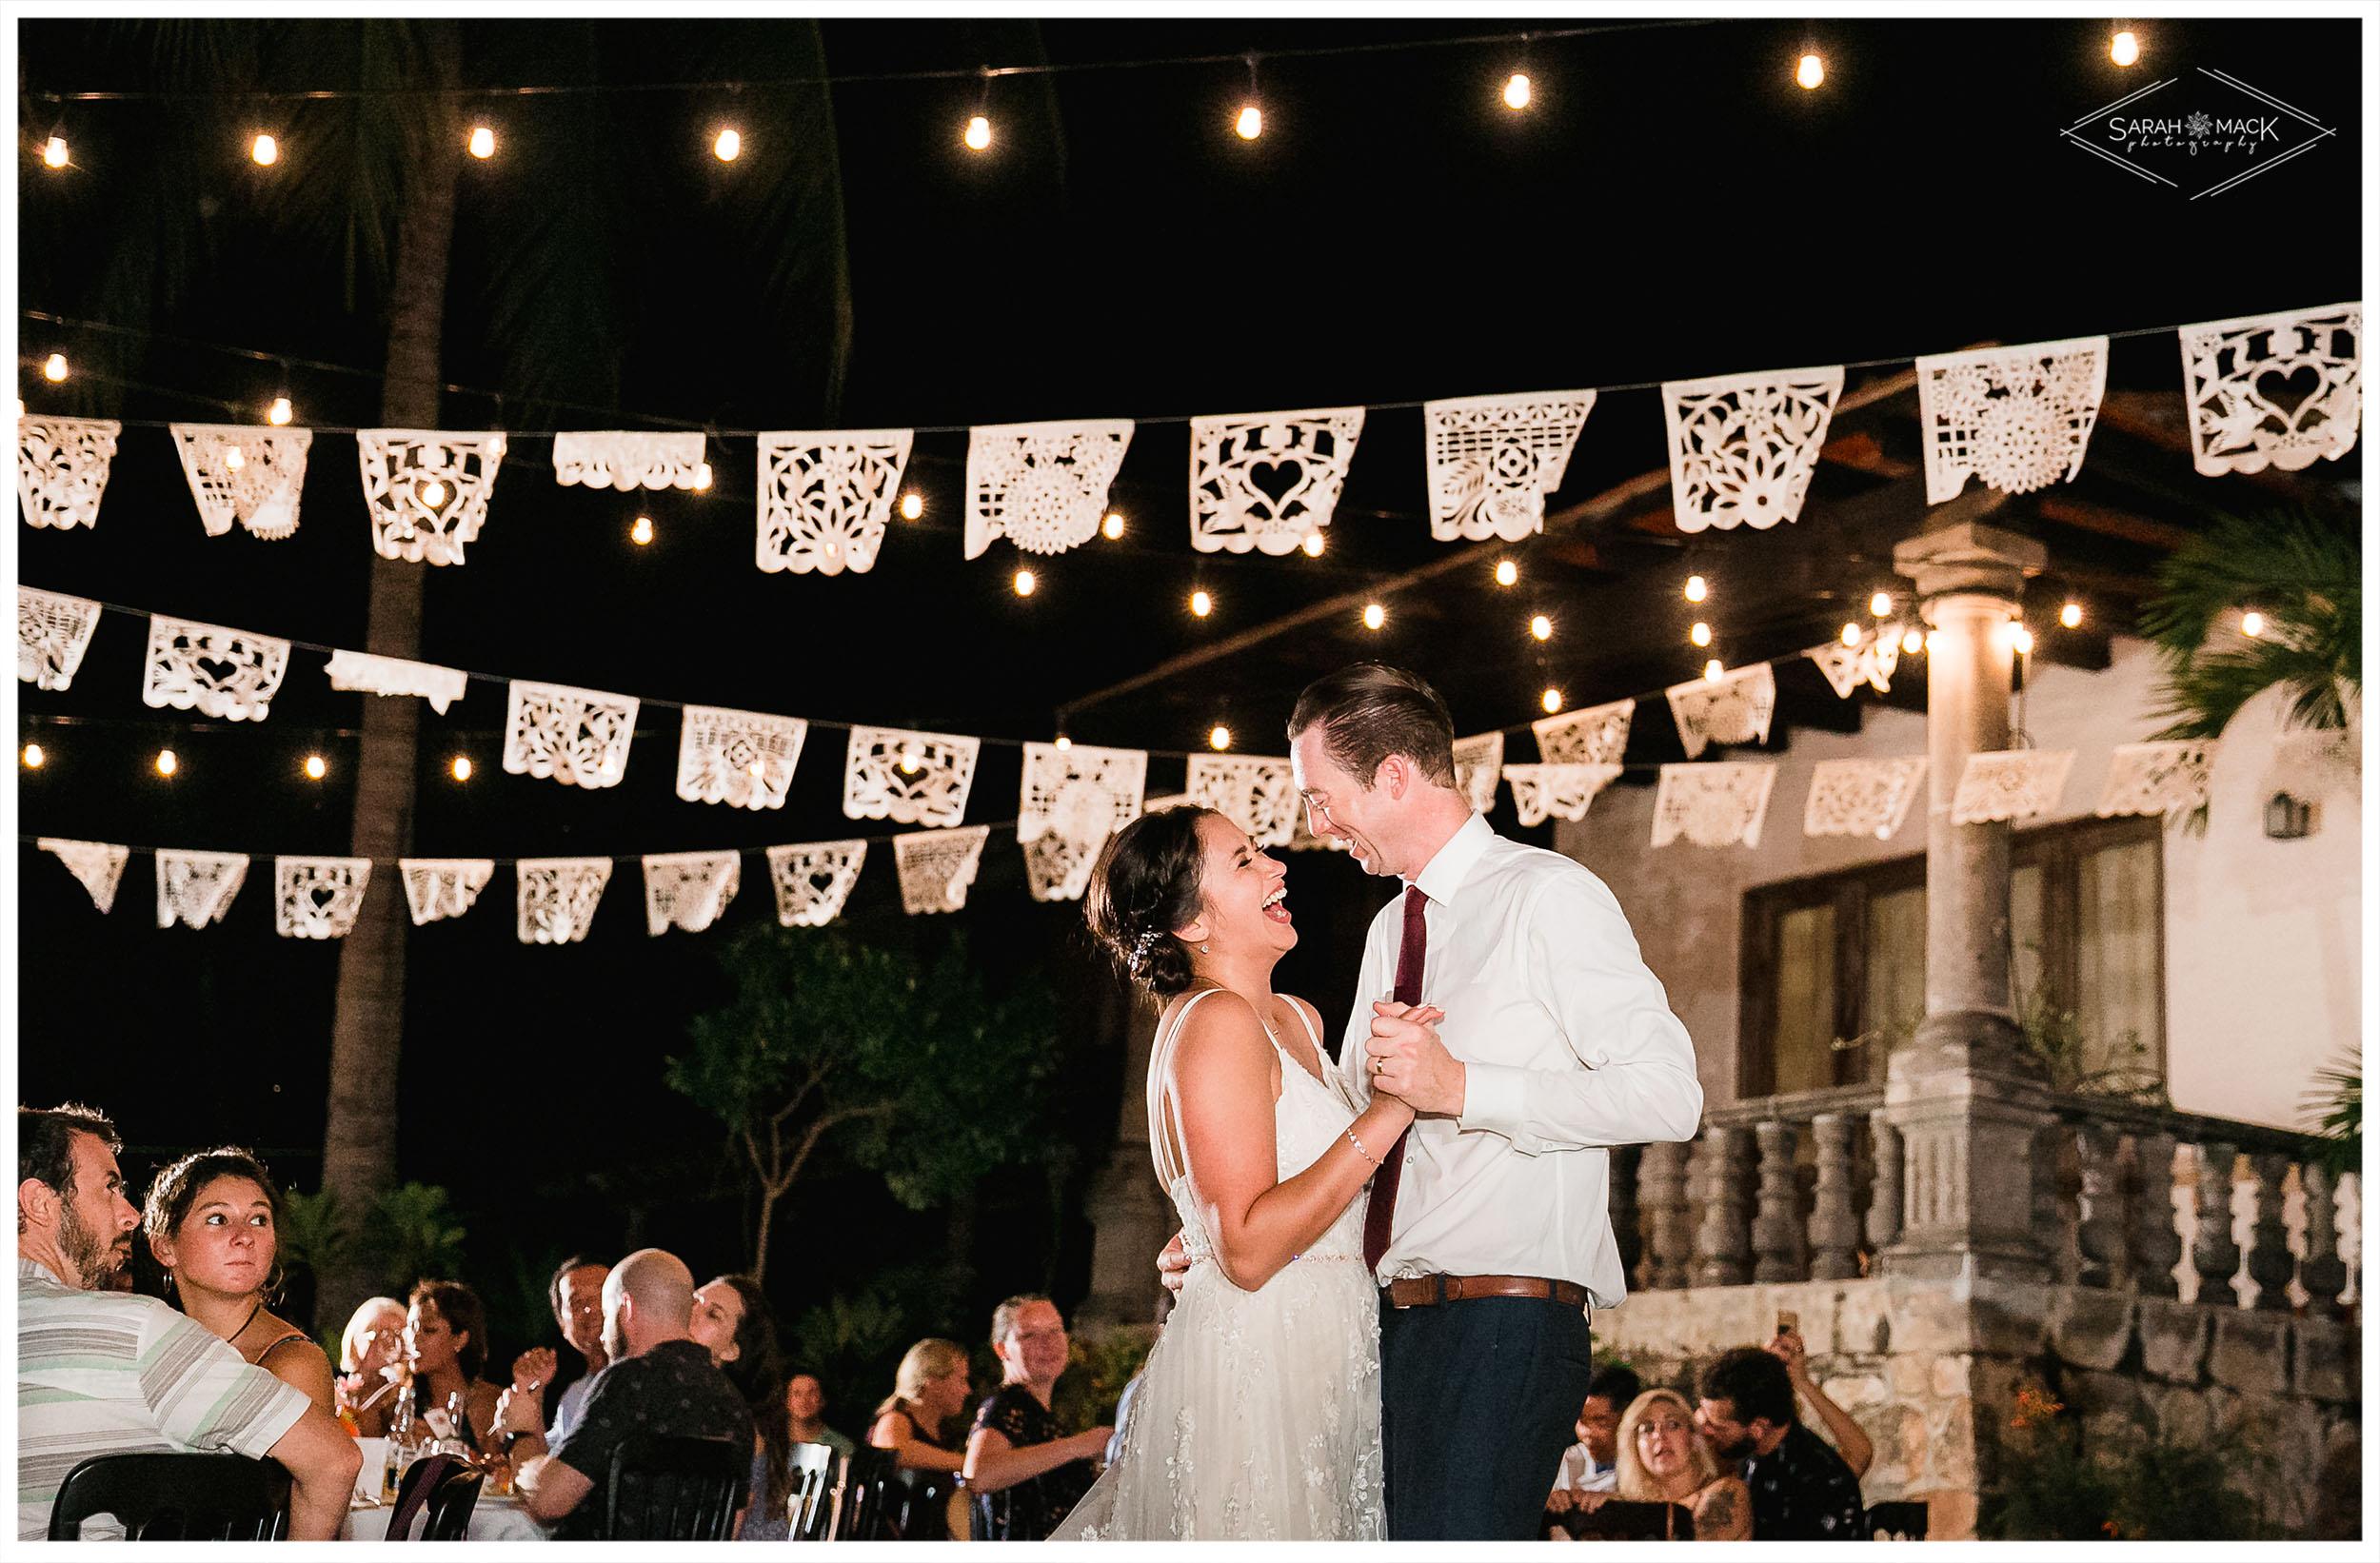 ES-Flor-de-Playa-Sayulita-Wedding-Photography-60.jpg